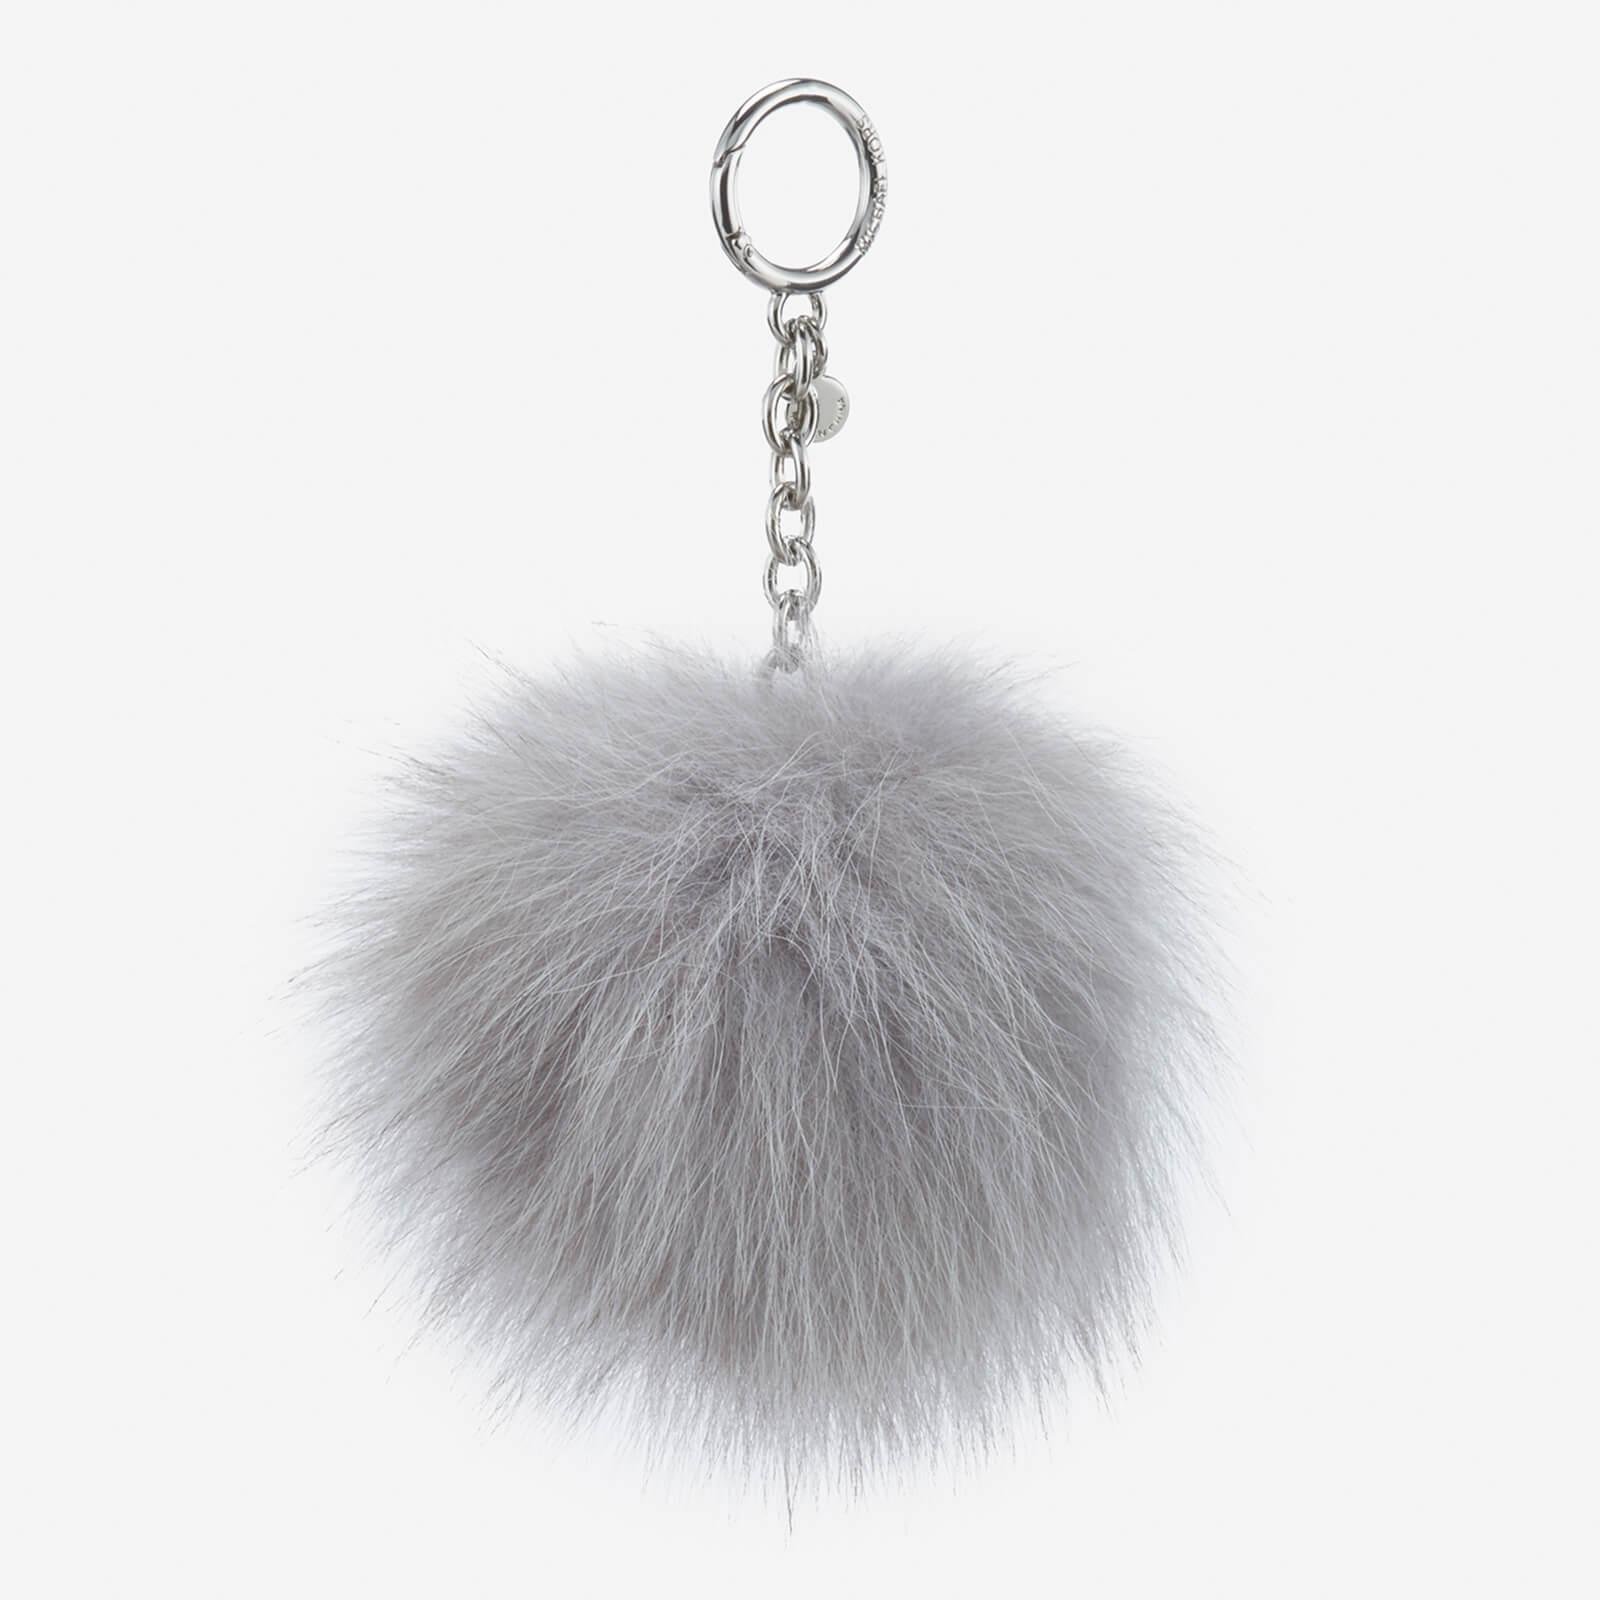 MICHAEL MICHAEL KORS Women s Large Fur Pom Pom - Silver - Free UK Delivery  over £50 e761b18cbc643